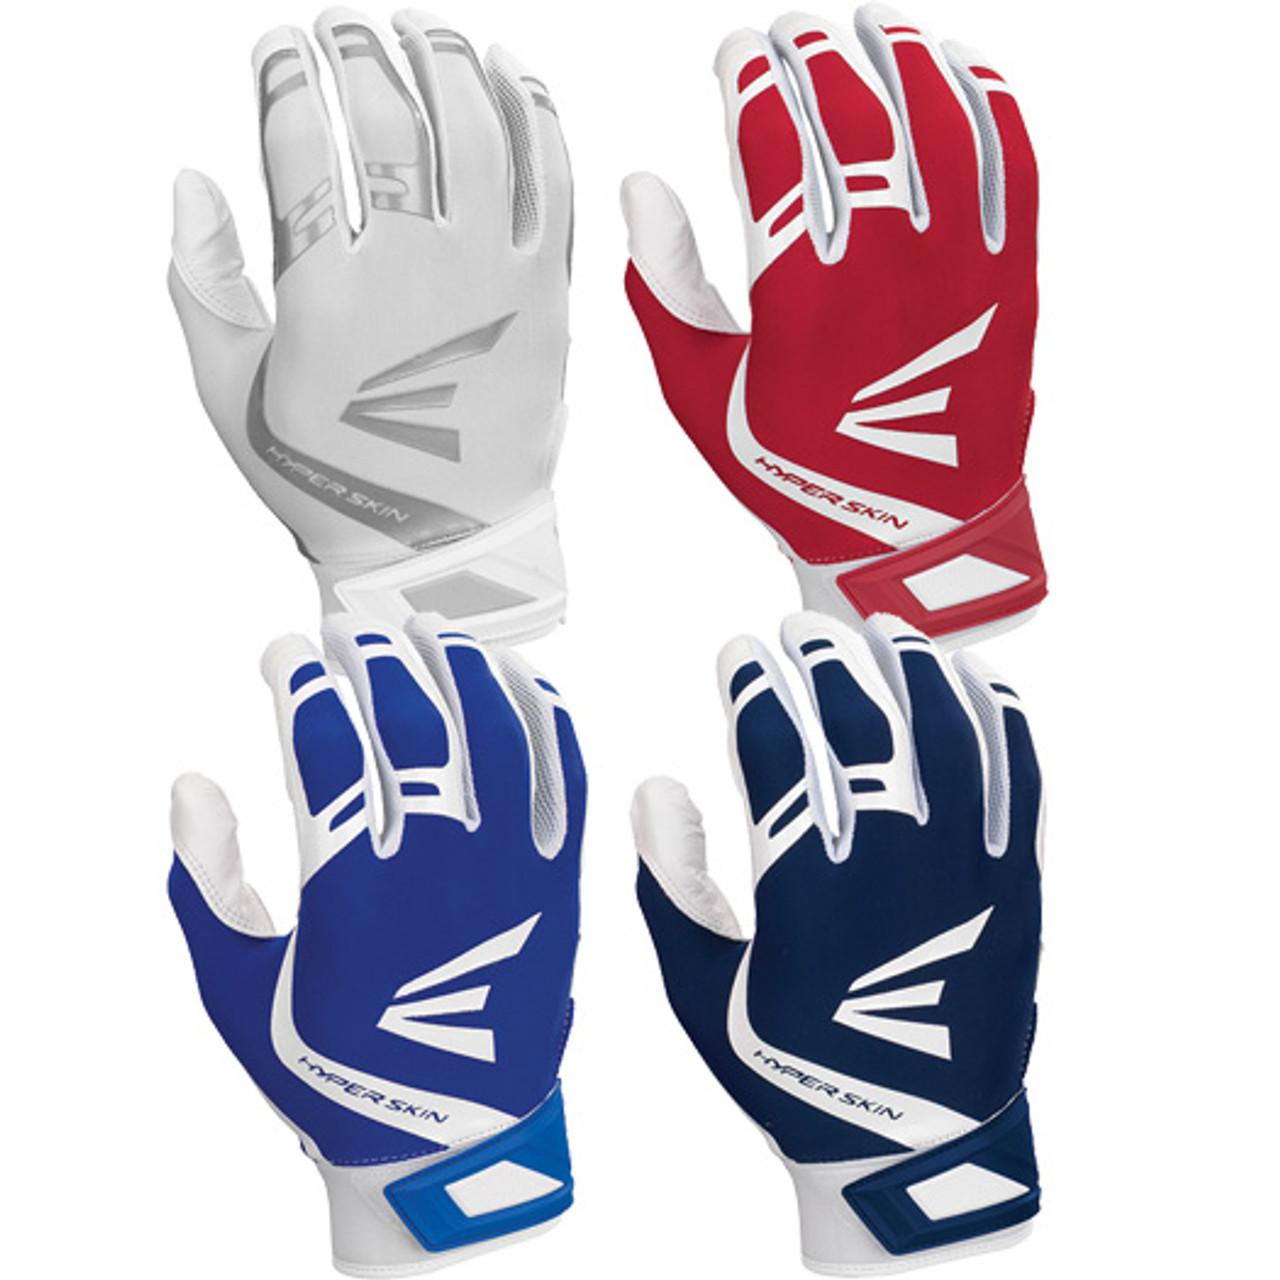 New Easton ZF7 VRS Hyperskin Women/'s Fastpitch Softball Batting Gloves